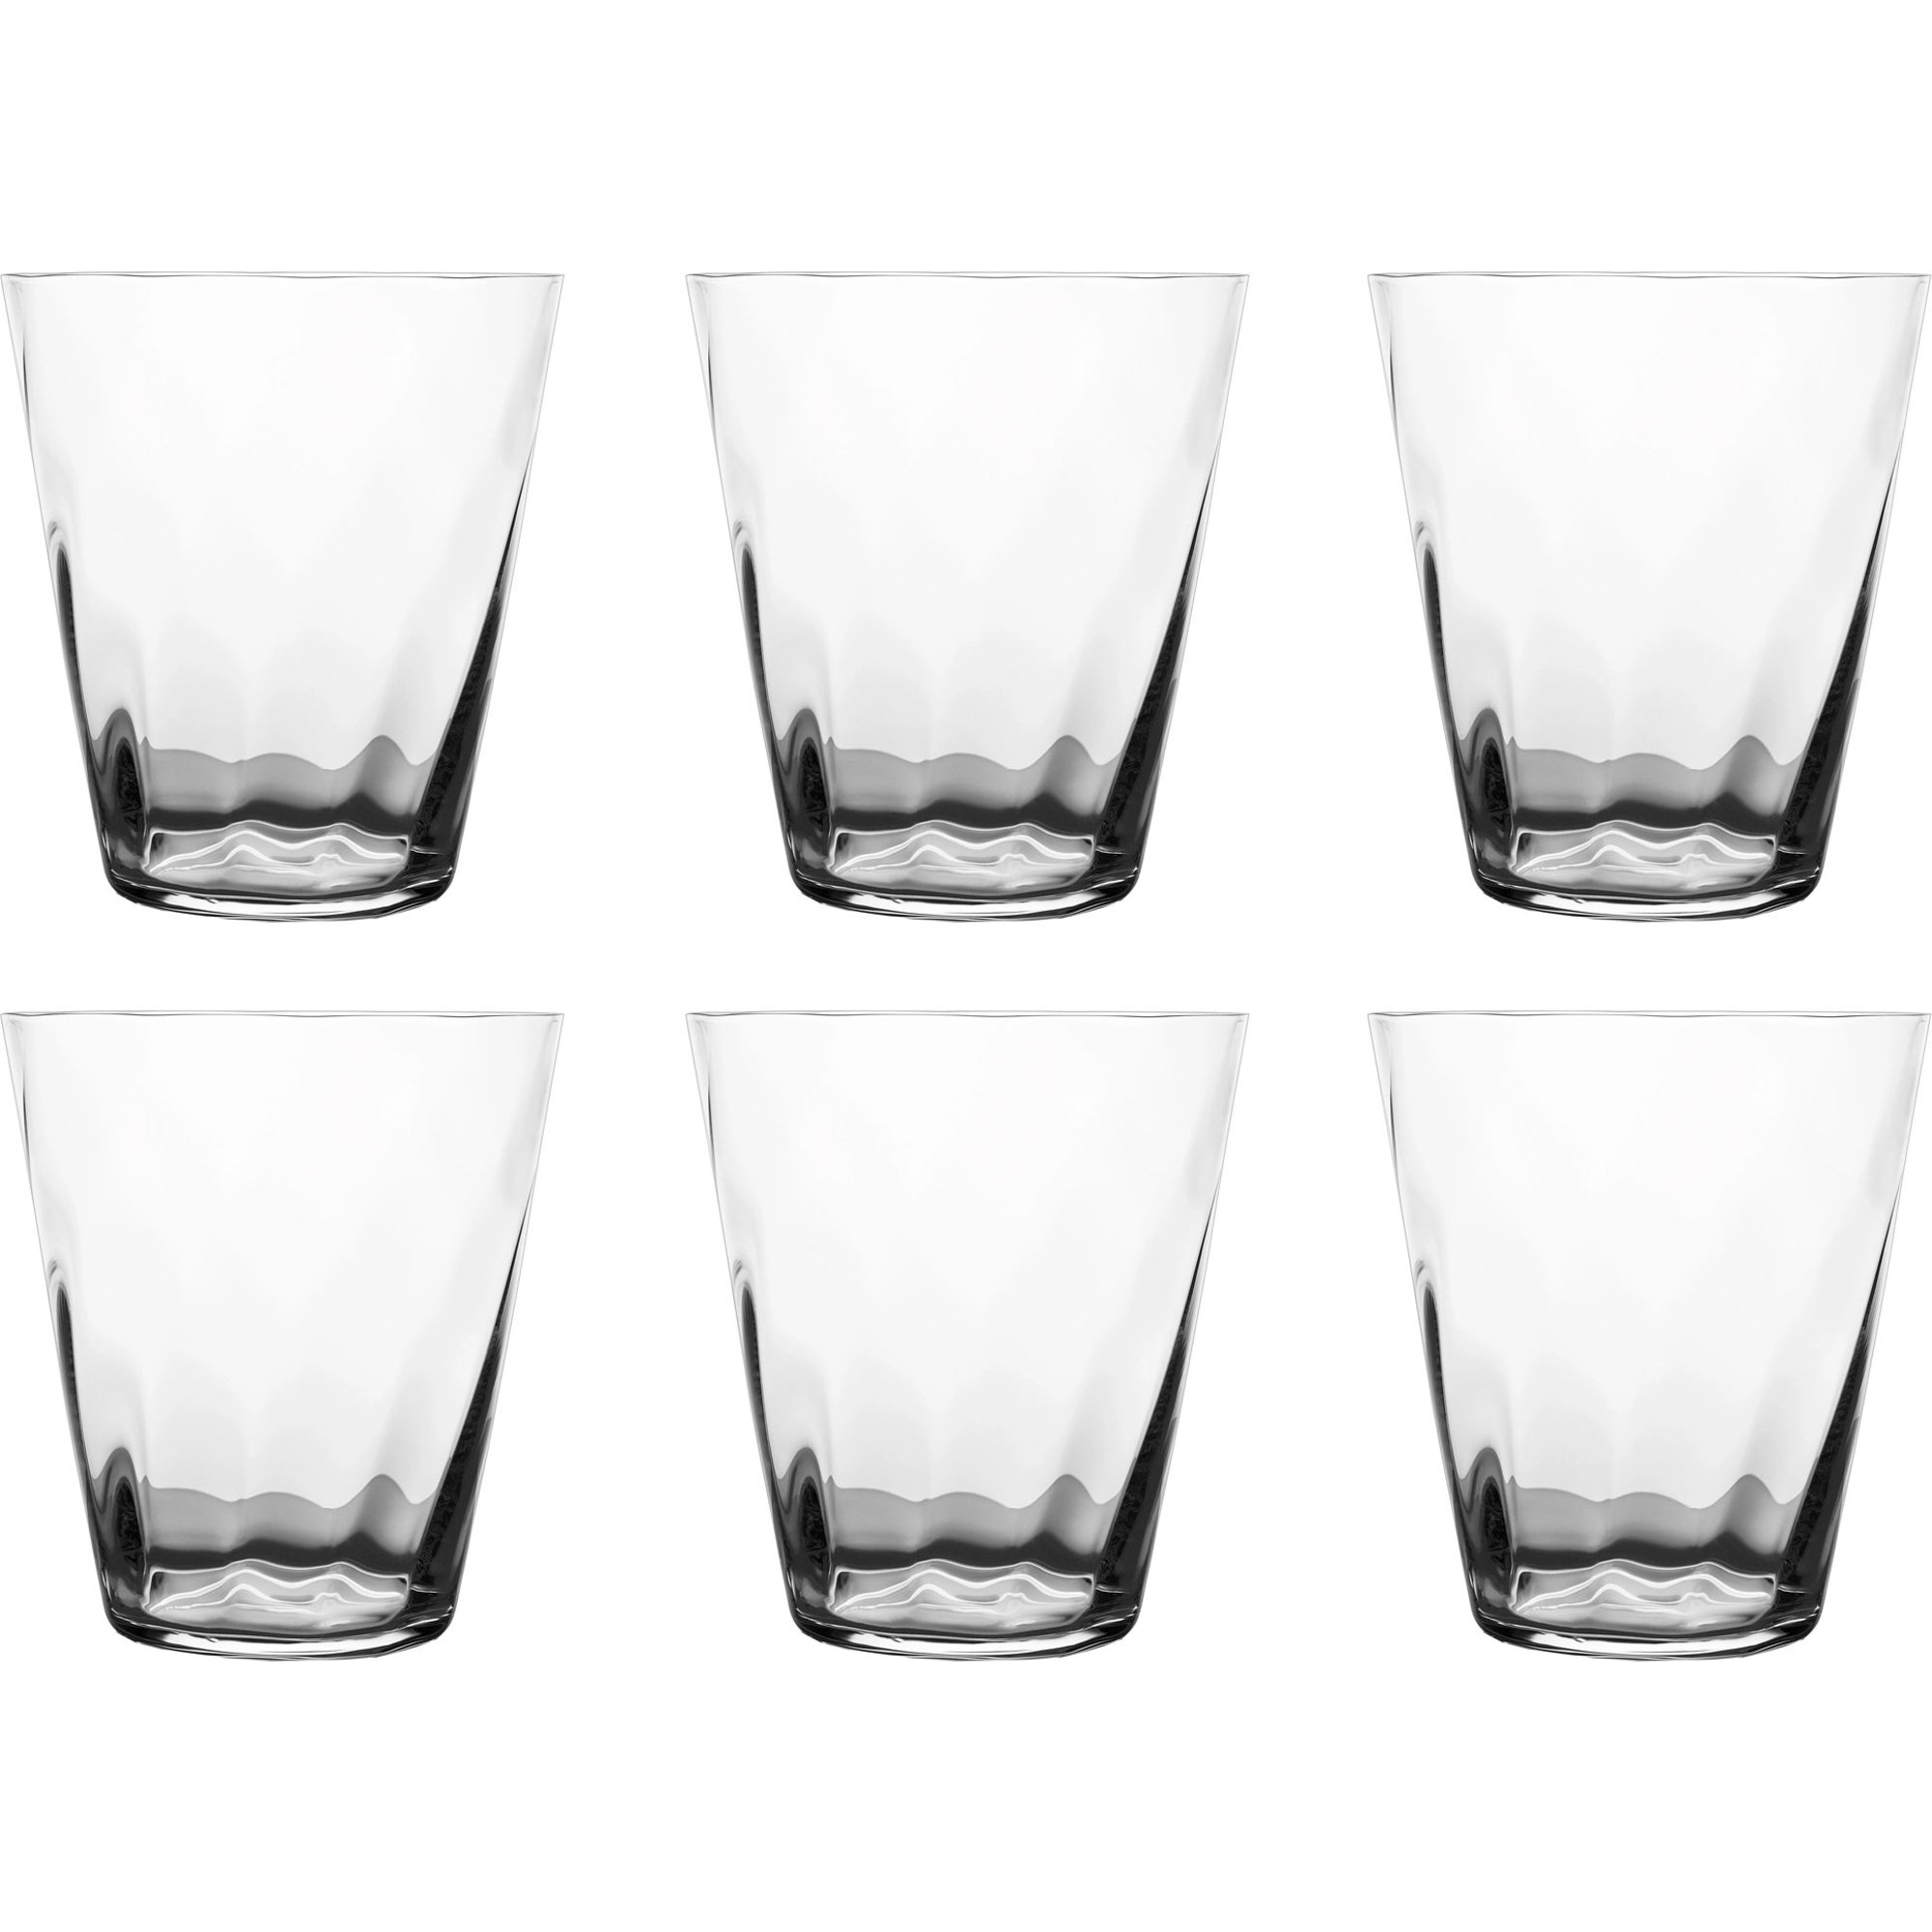 Zalto Coupe Effect vattenglas 380 ml. 6 st.